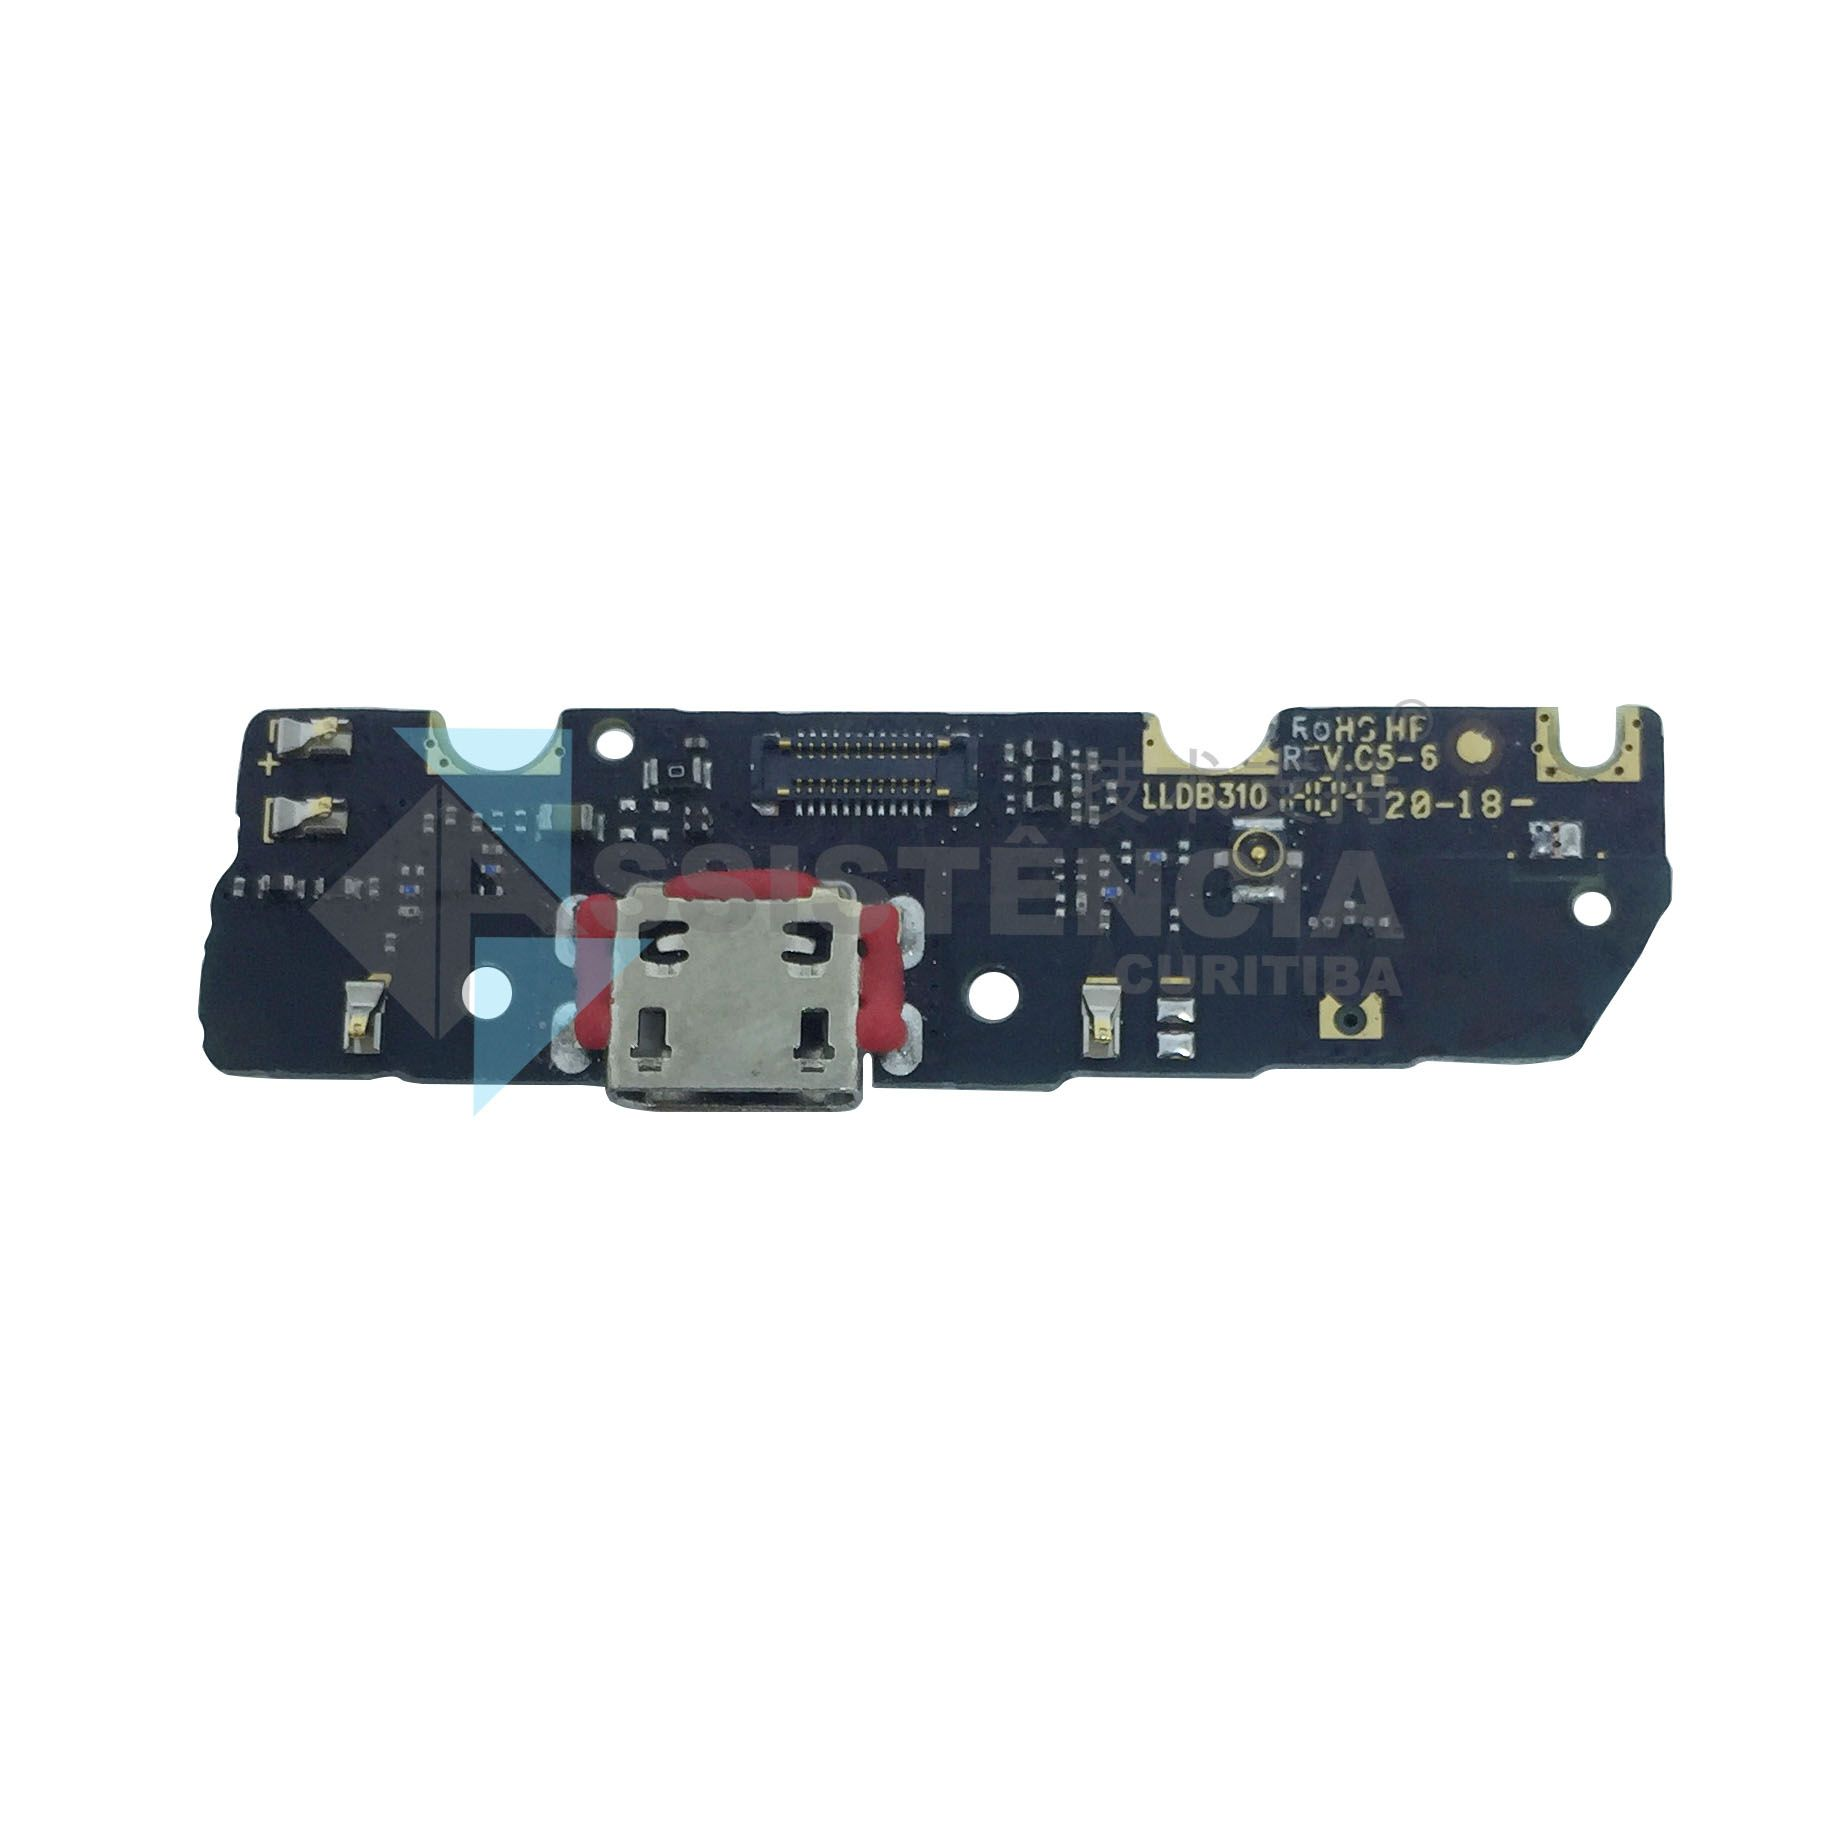 Placa Conector de Carga Motorola Moto G6 Play XT1922 Original